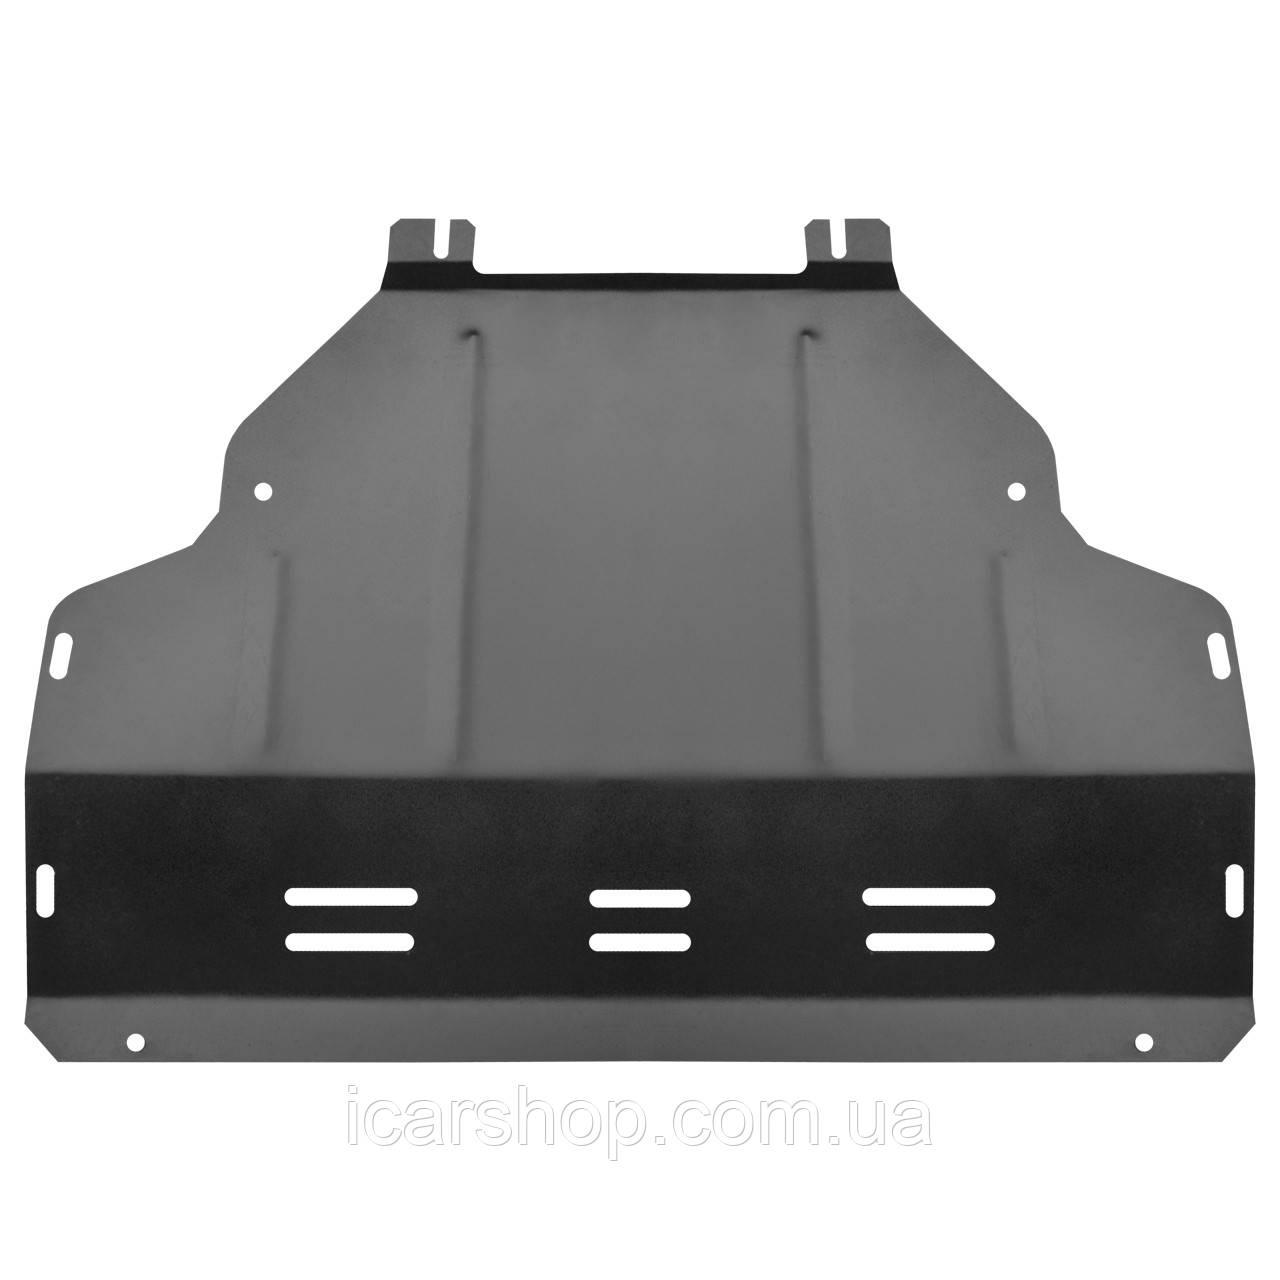 Защита Двигателя / КПП / Радиатора R. Trafic II 01- (2,5L) Titan